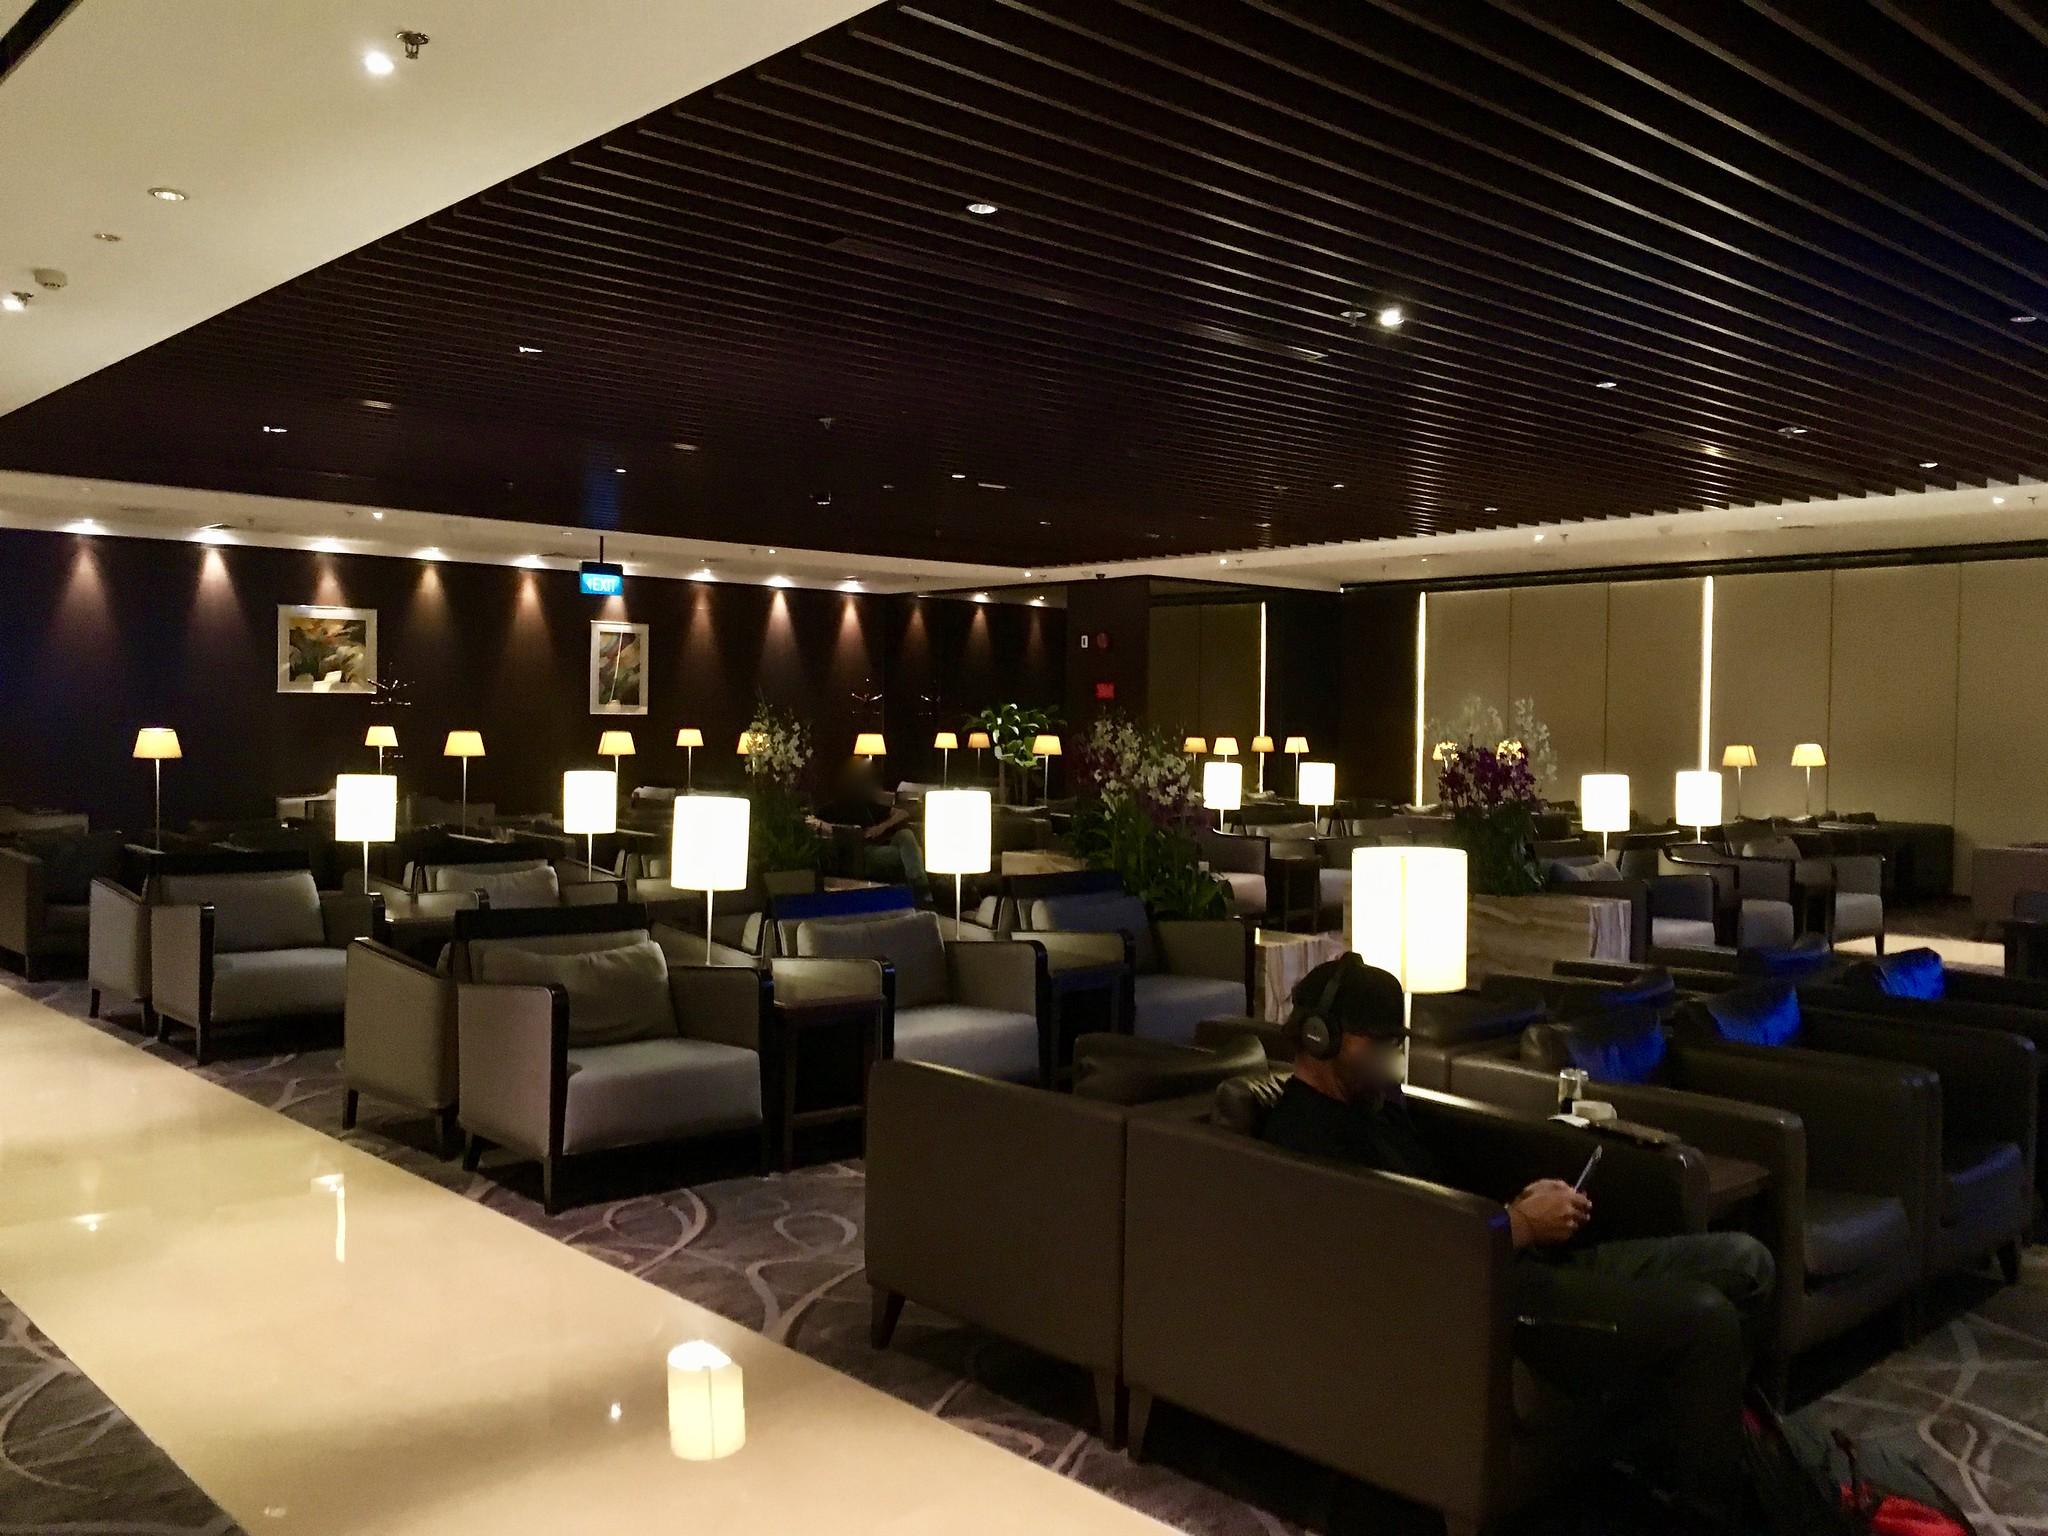 Singapore Changi Airport Terminal 2 SilverKris Business Lounge